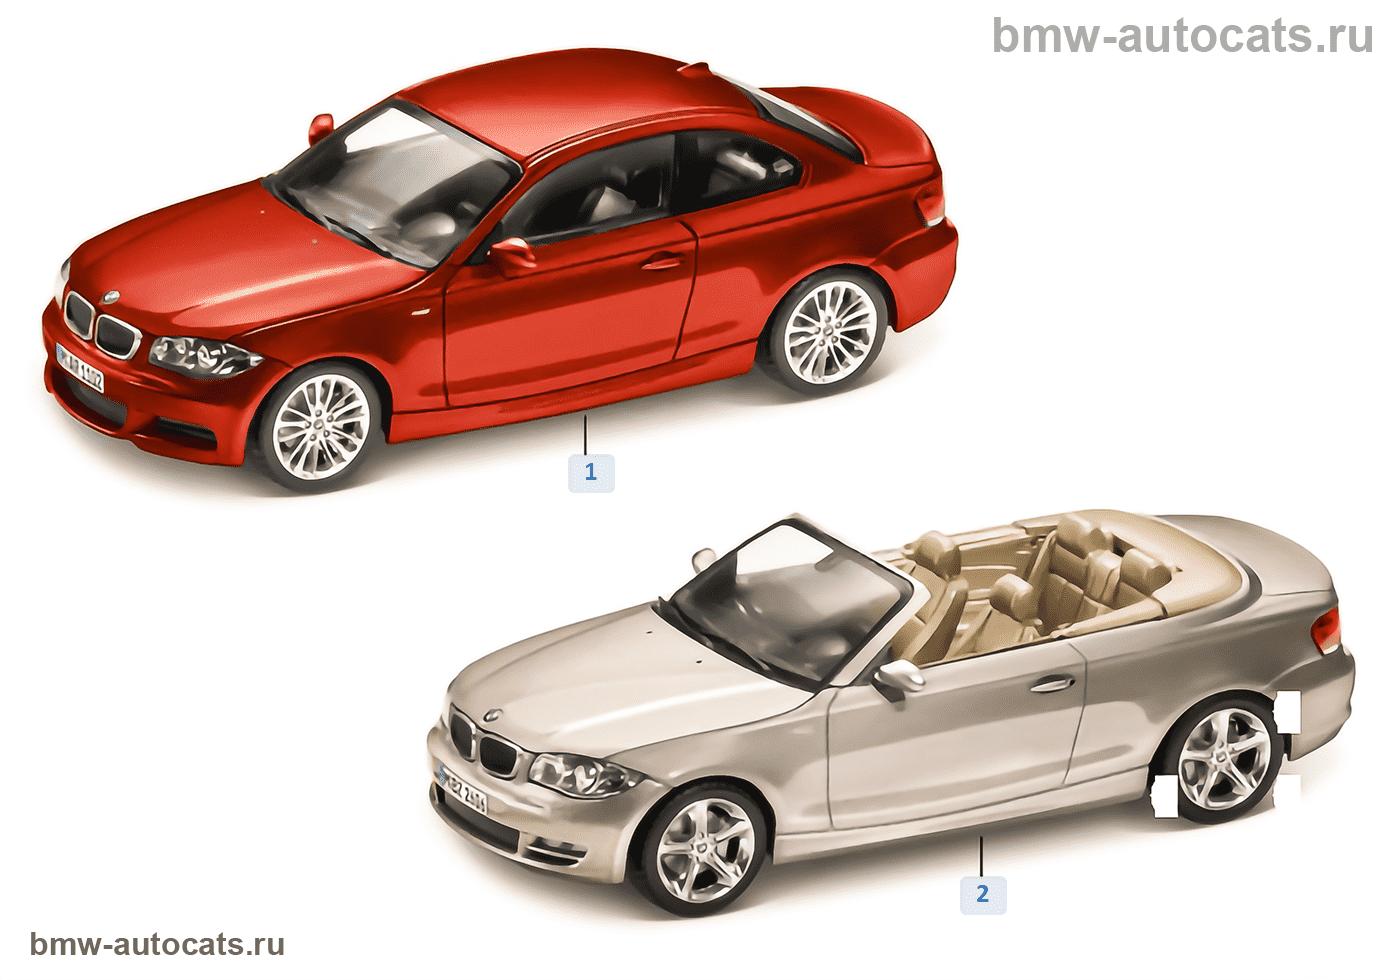 BMW Miniaturen — BMW 1er Serie 2010/11